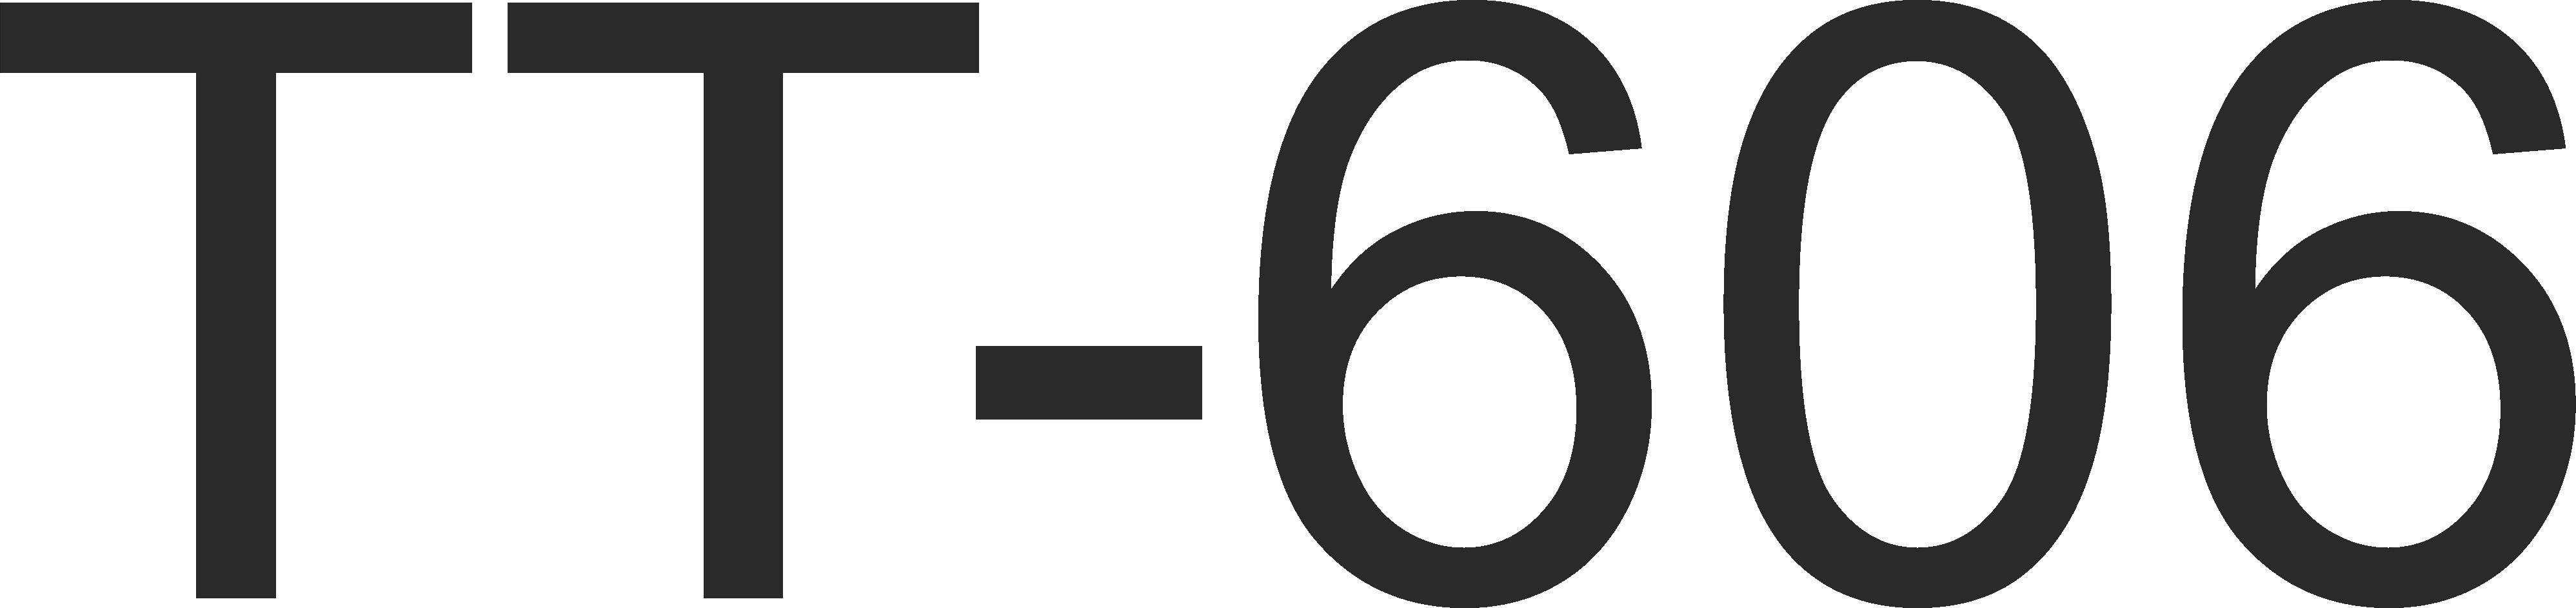 tt-606-badge